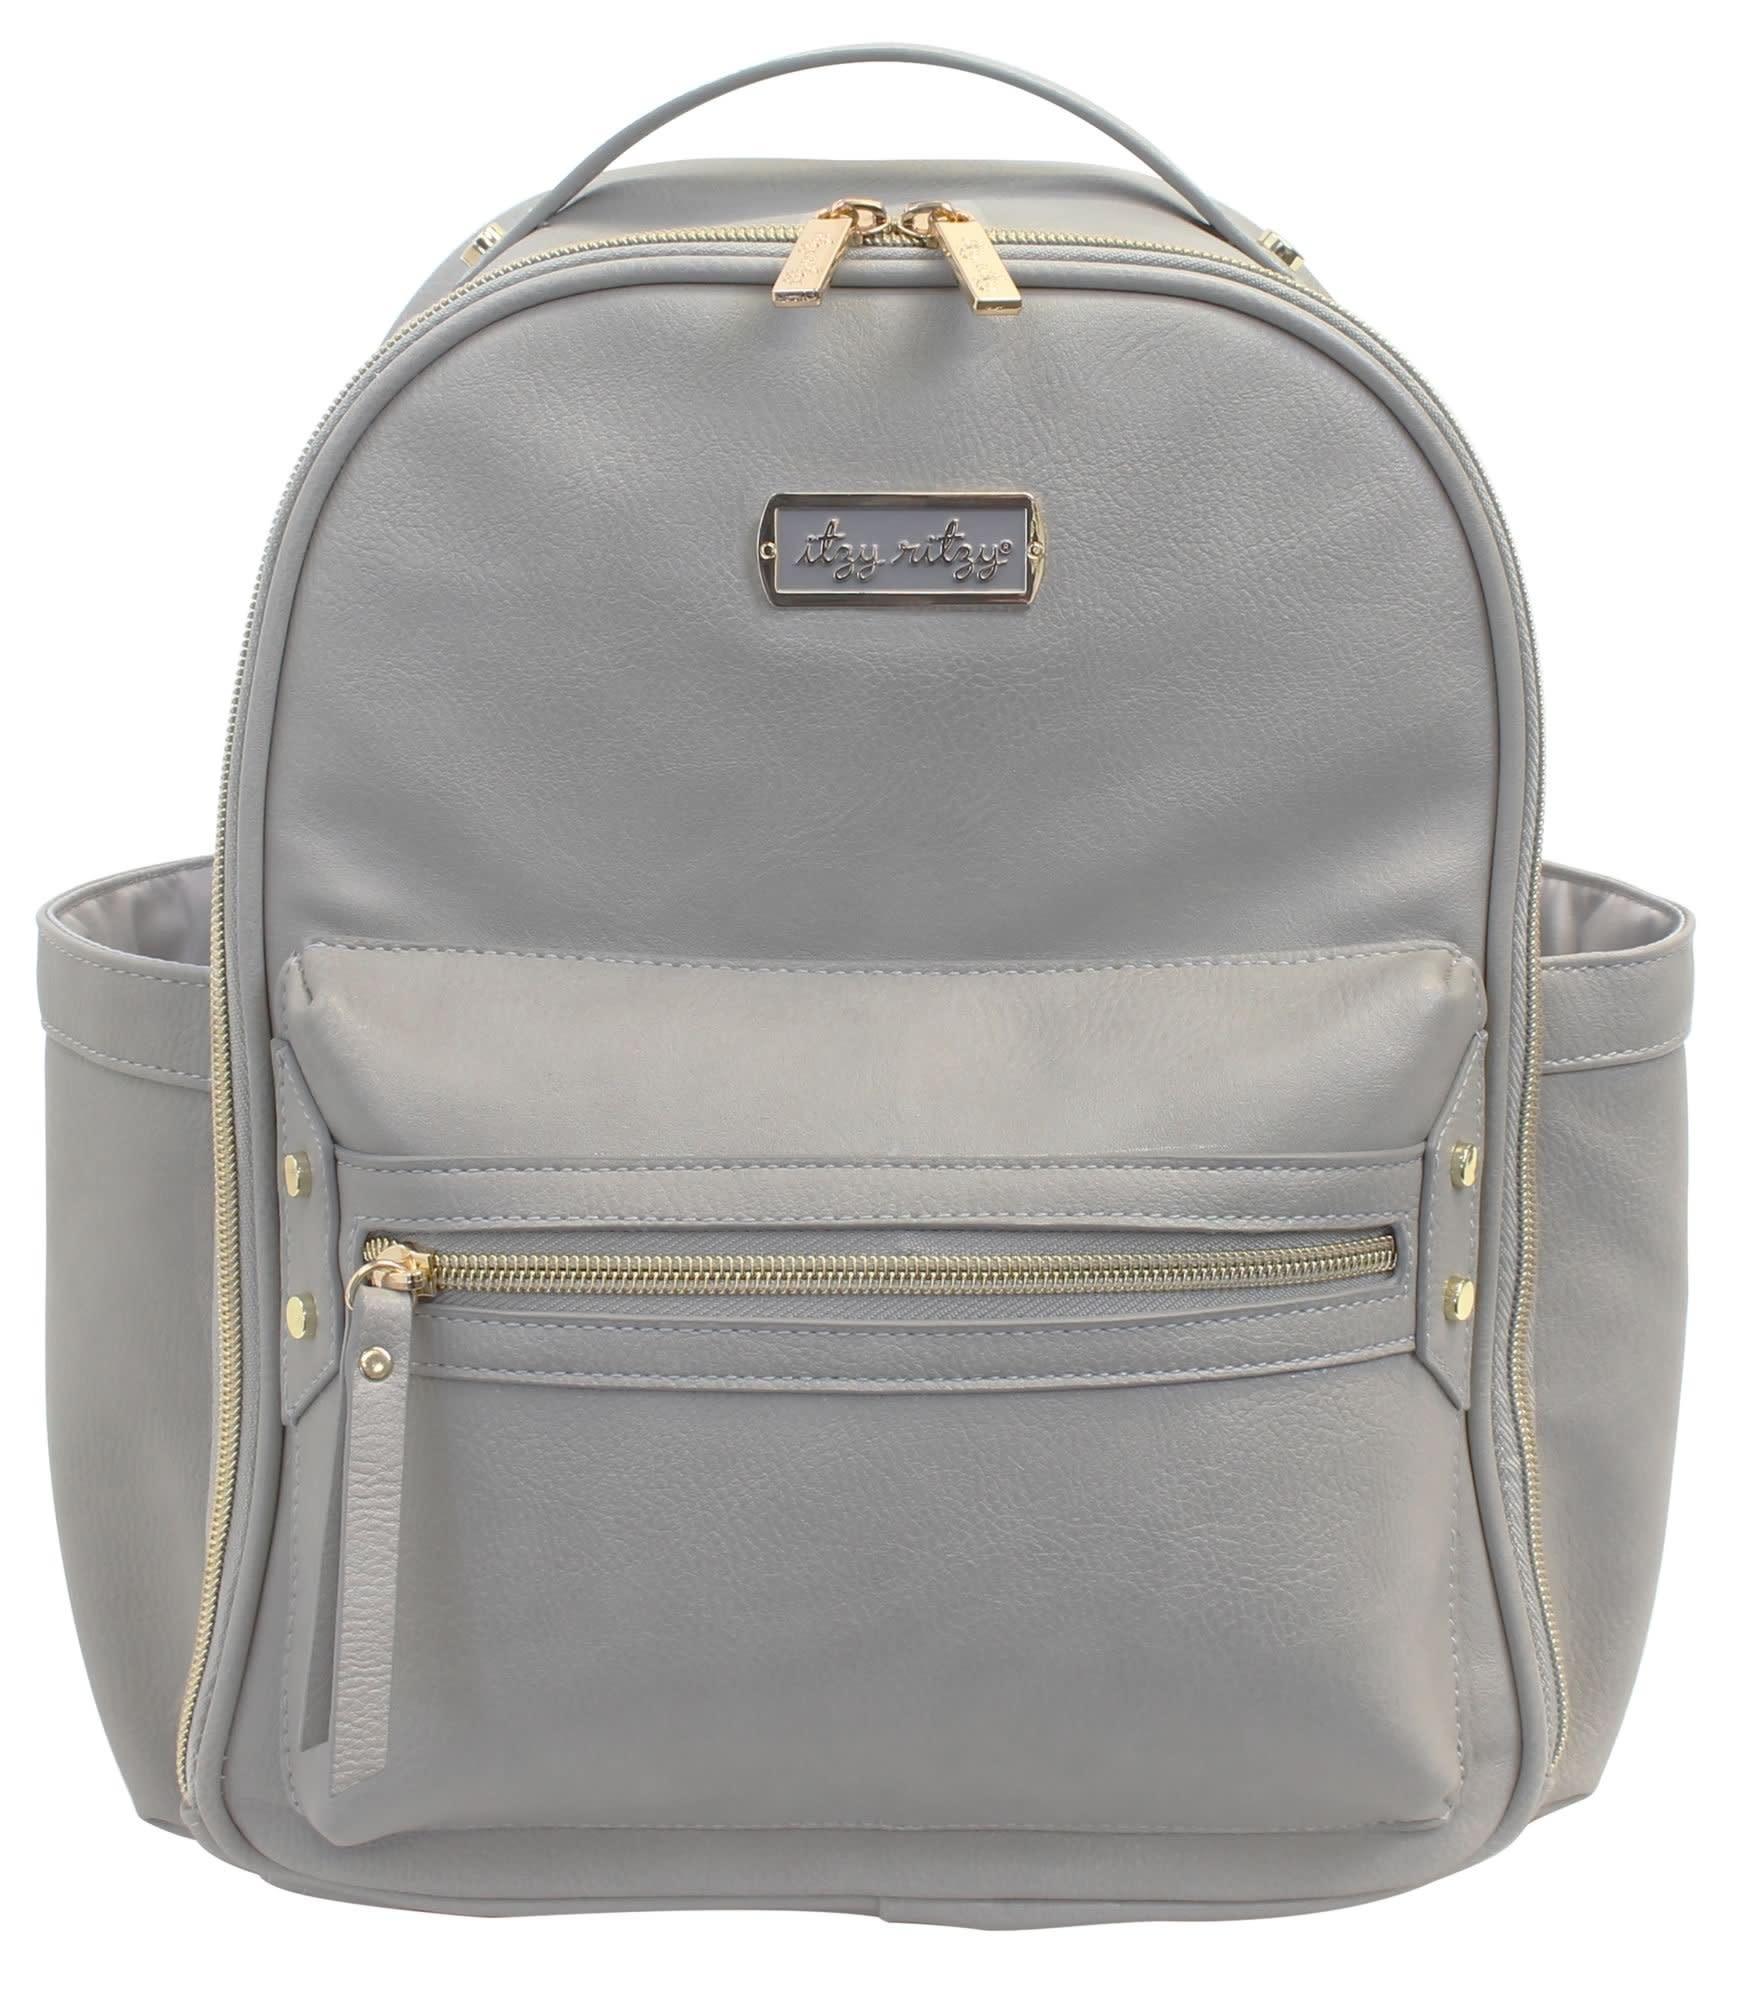 Itzy Ritzy Itzy Ritzy Mini Backpack Diaper Bag